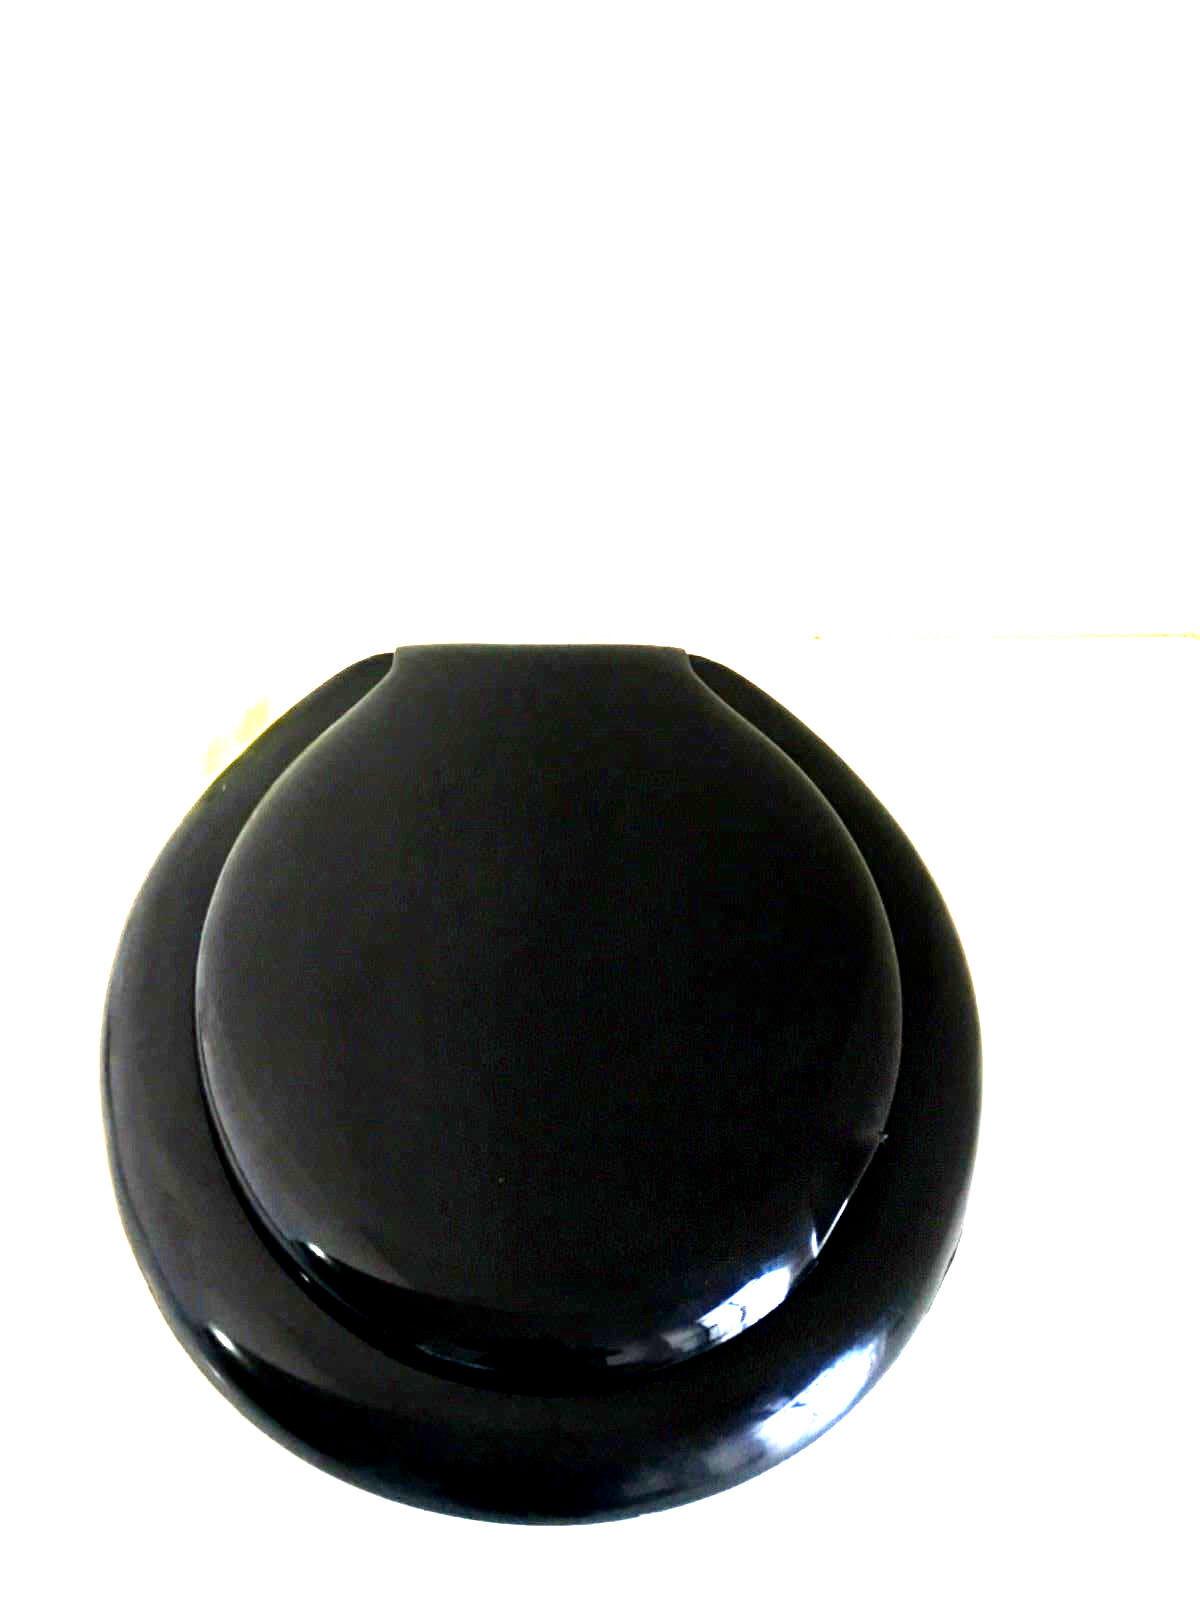 Diaqua 31170080 Sedile Copri-Wc Nero